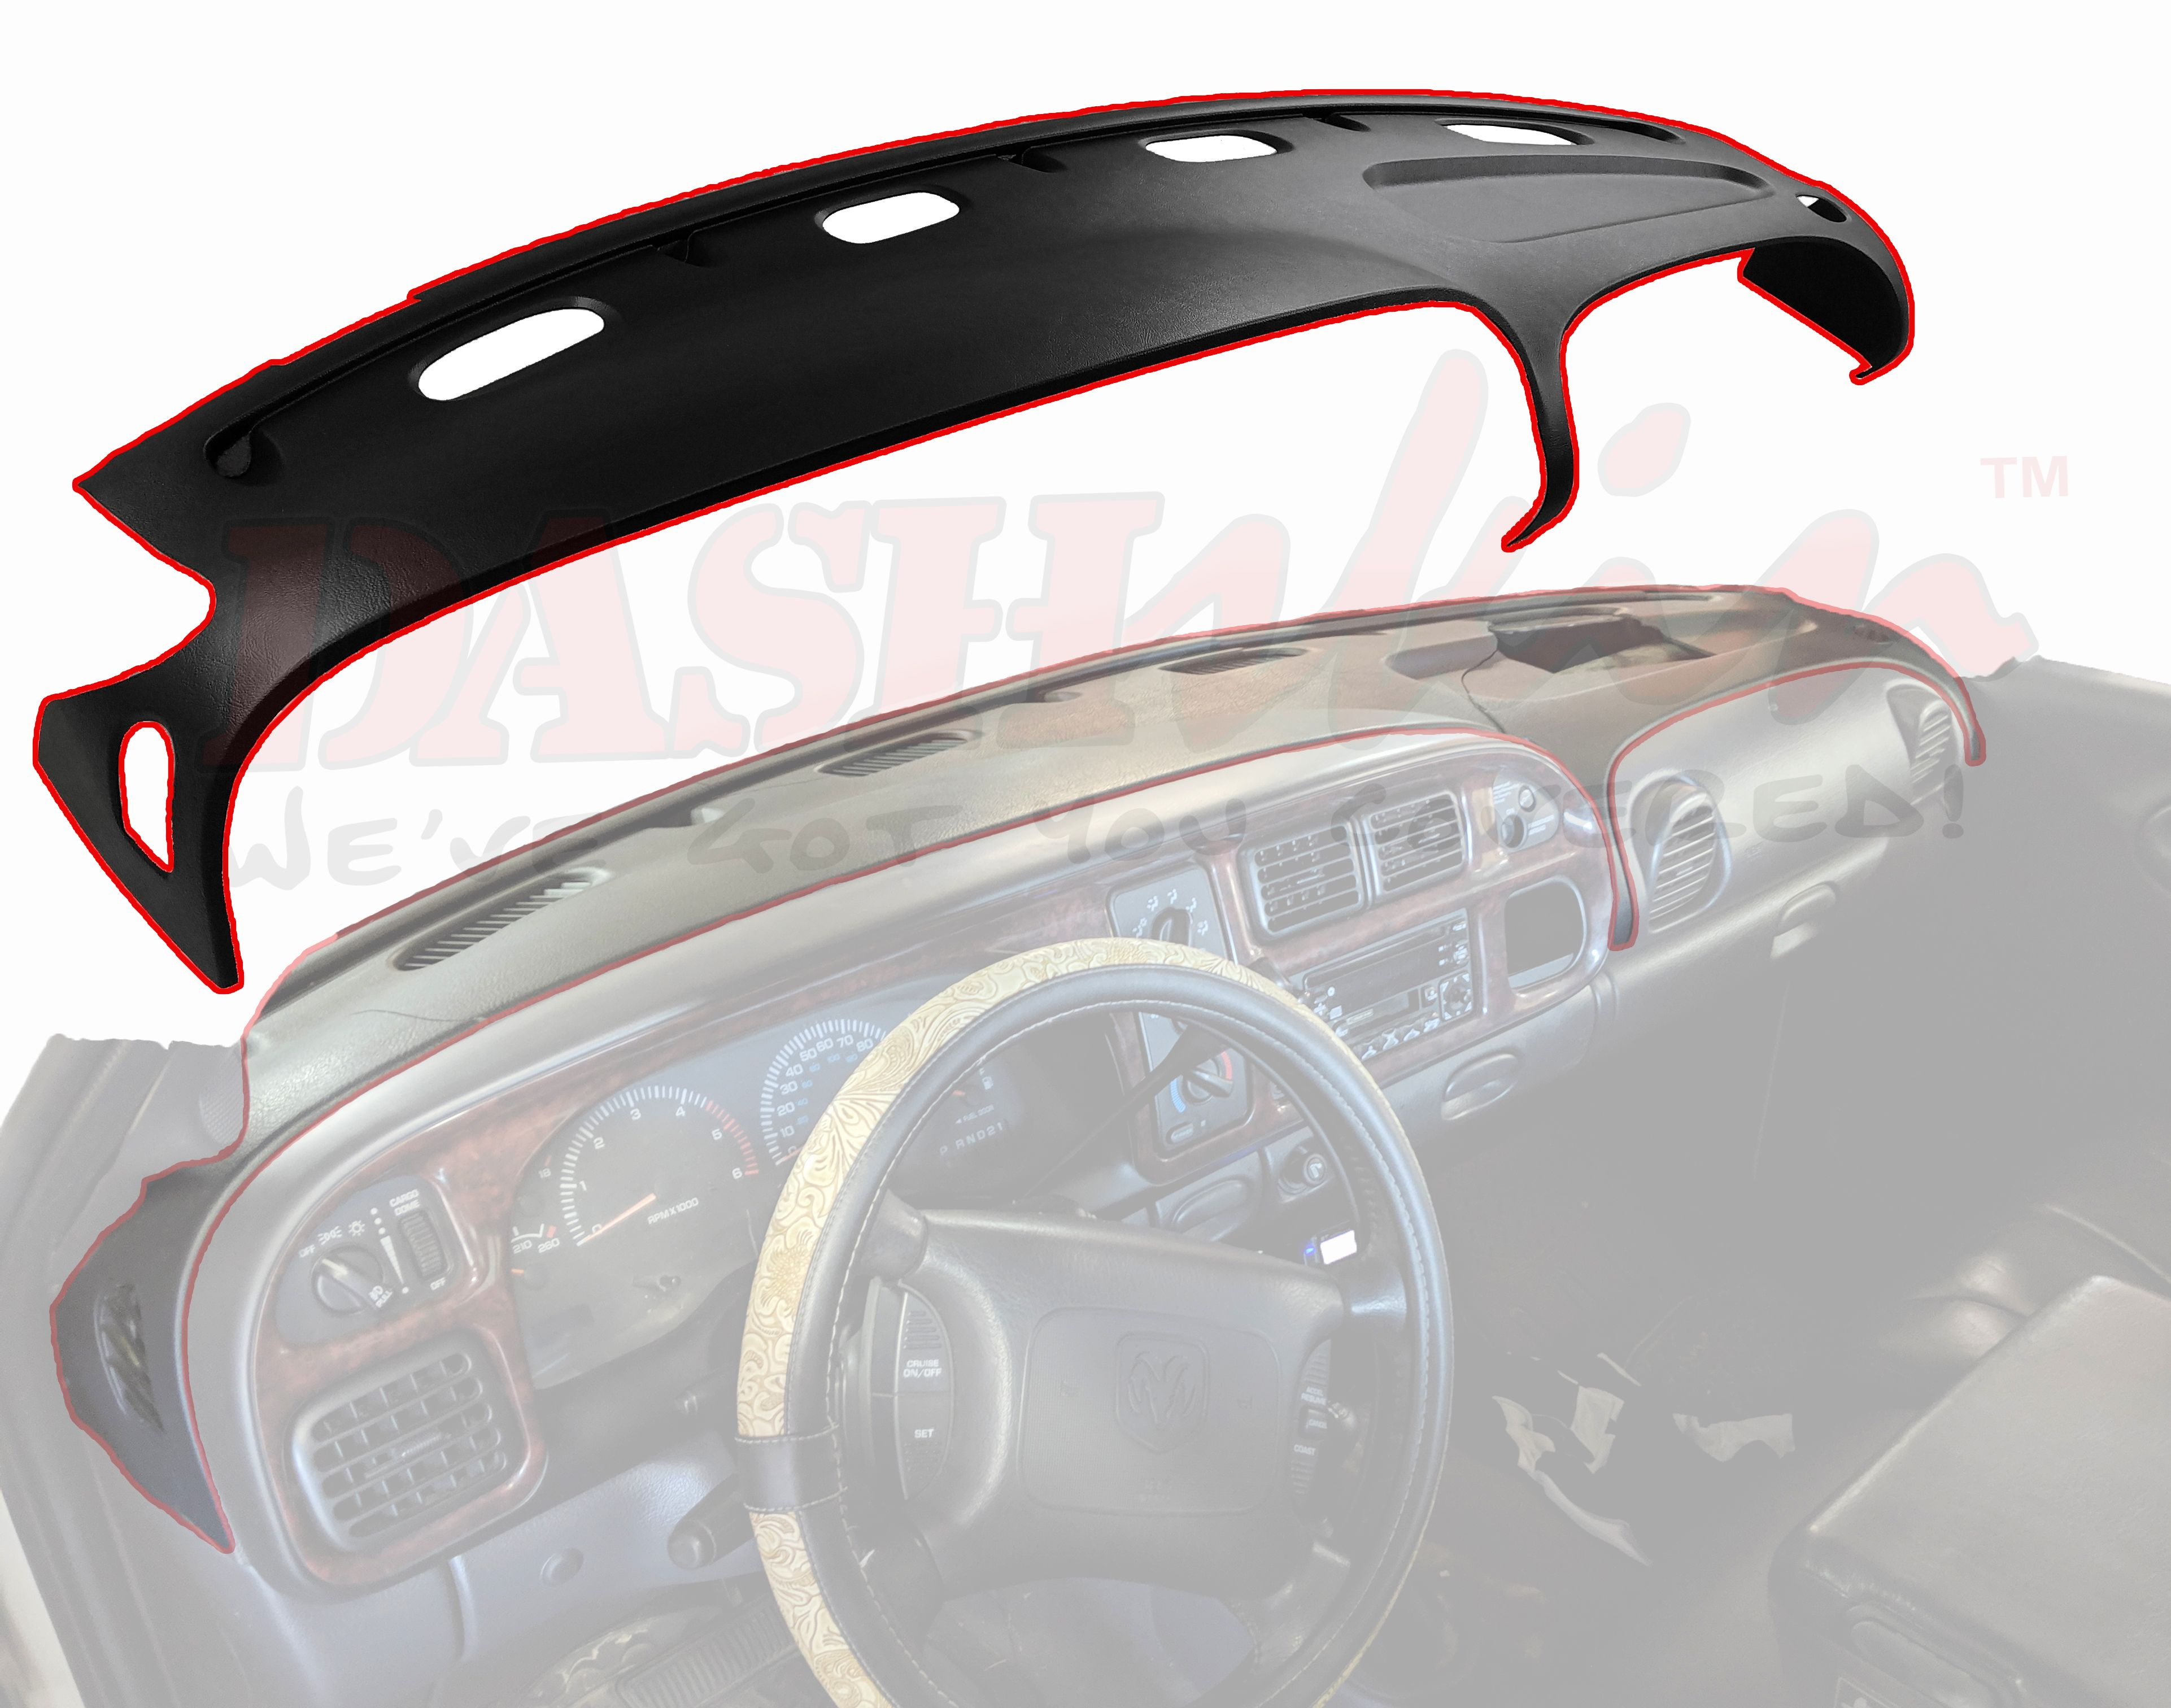 98 01 Dodge Ram 1500 98 02 Ram 2500 3500 Molded Dash Cover In 2020 Dodge Ram Dodge Ram 1500 Dodge